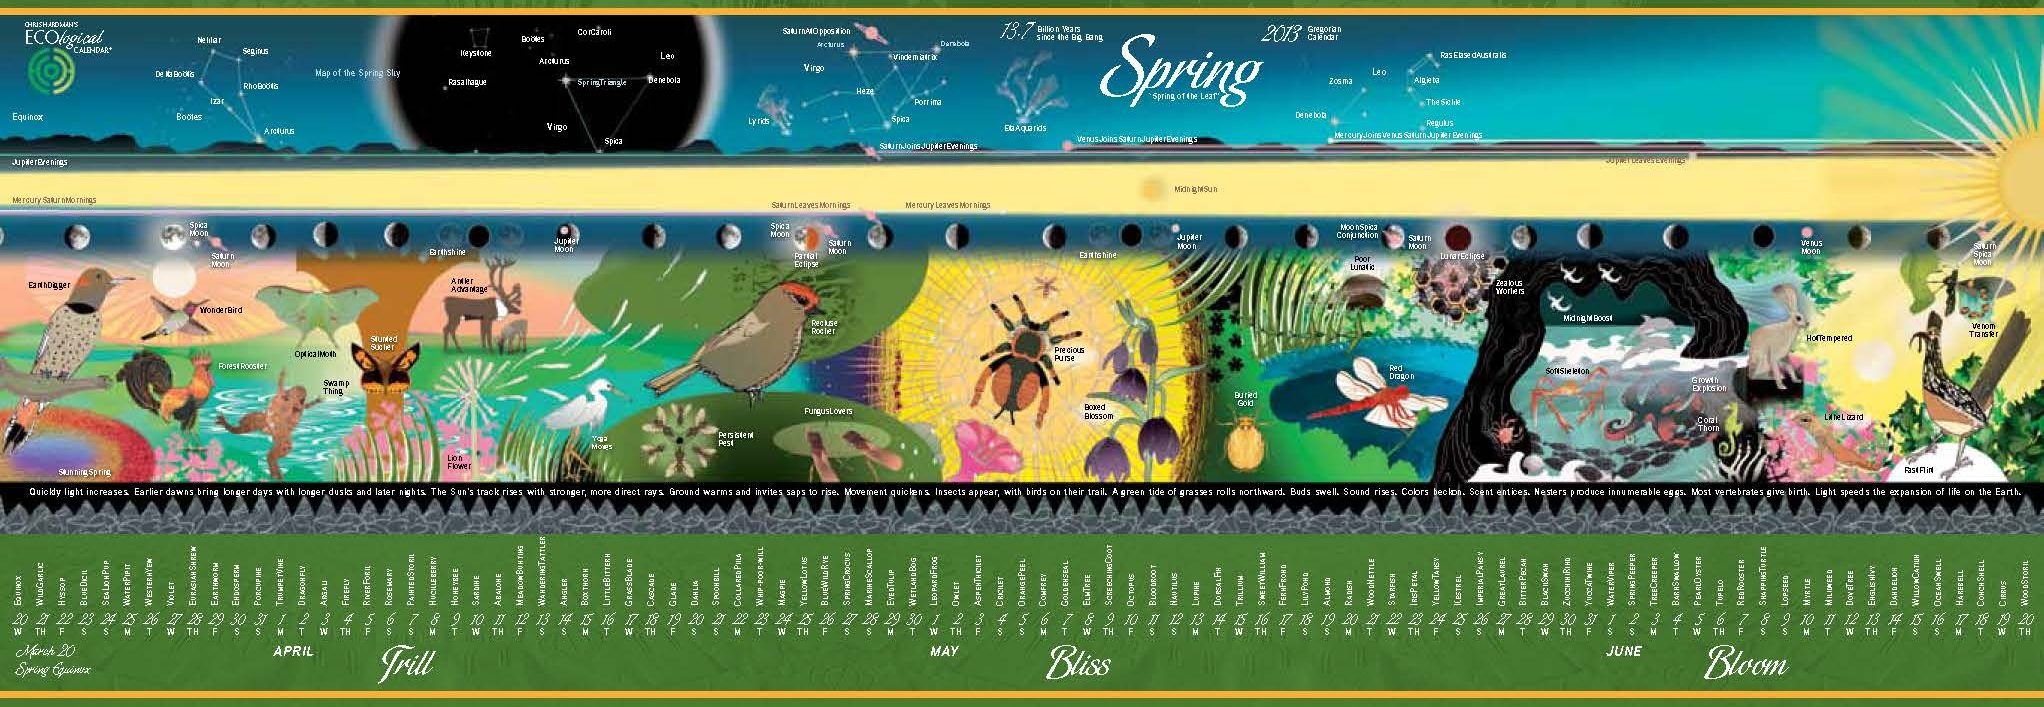 SpringPanel2013